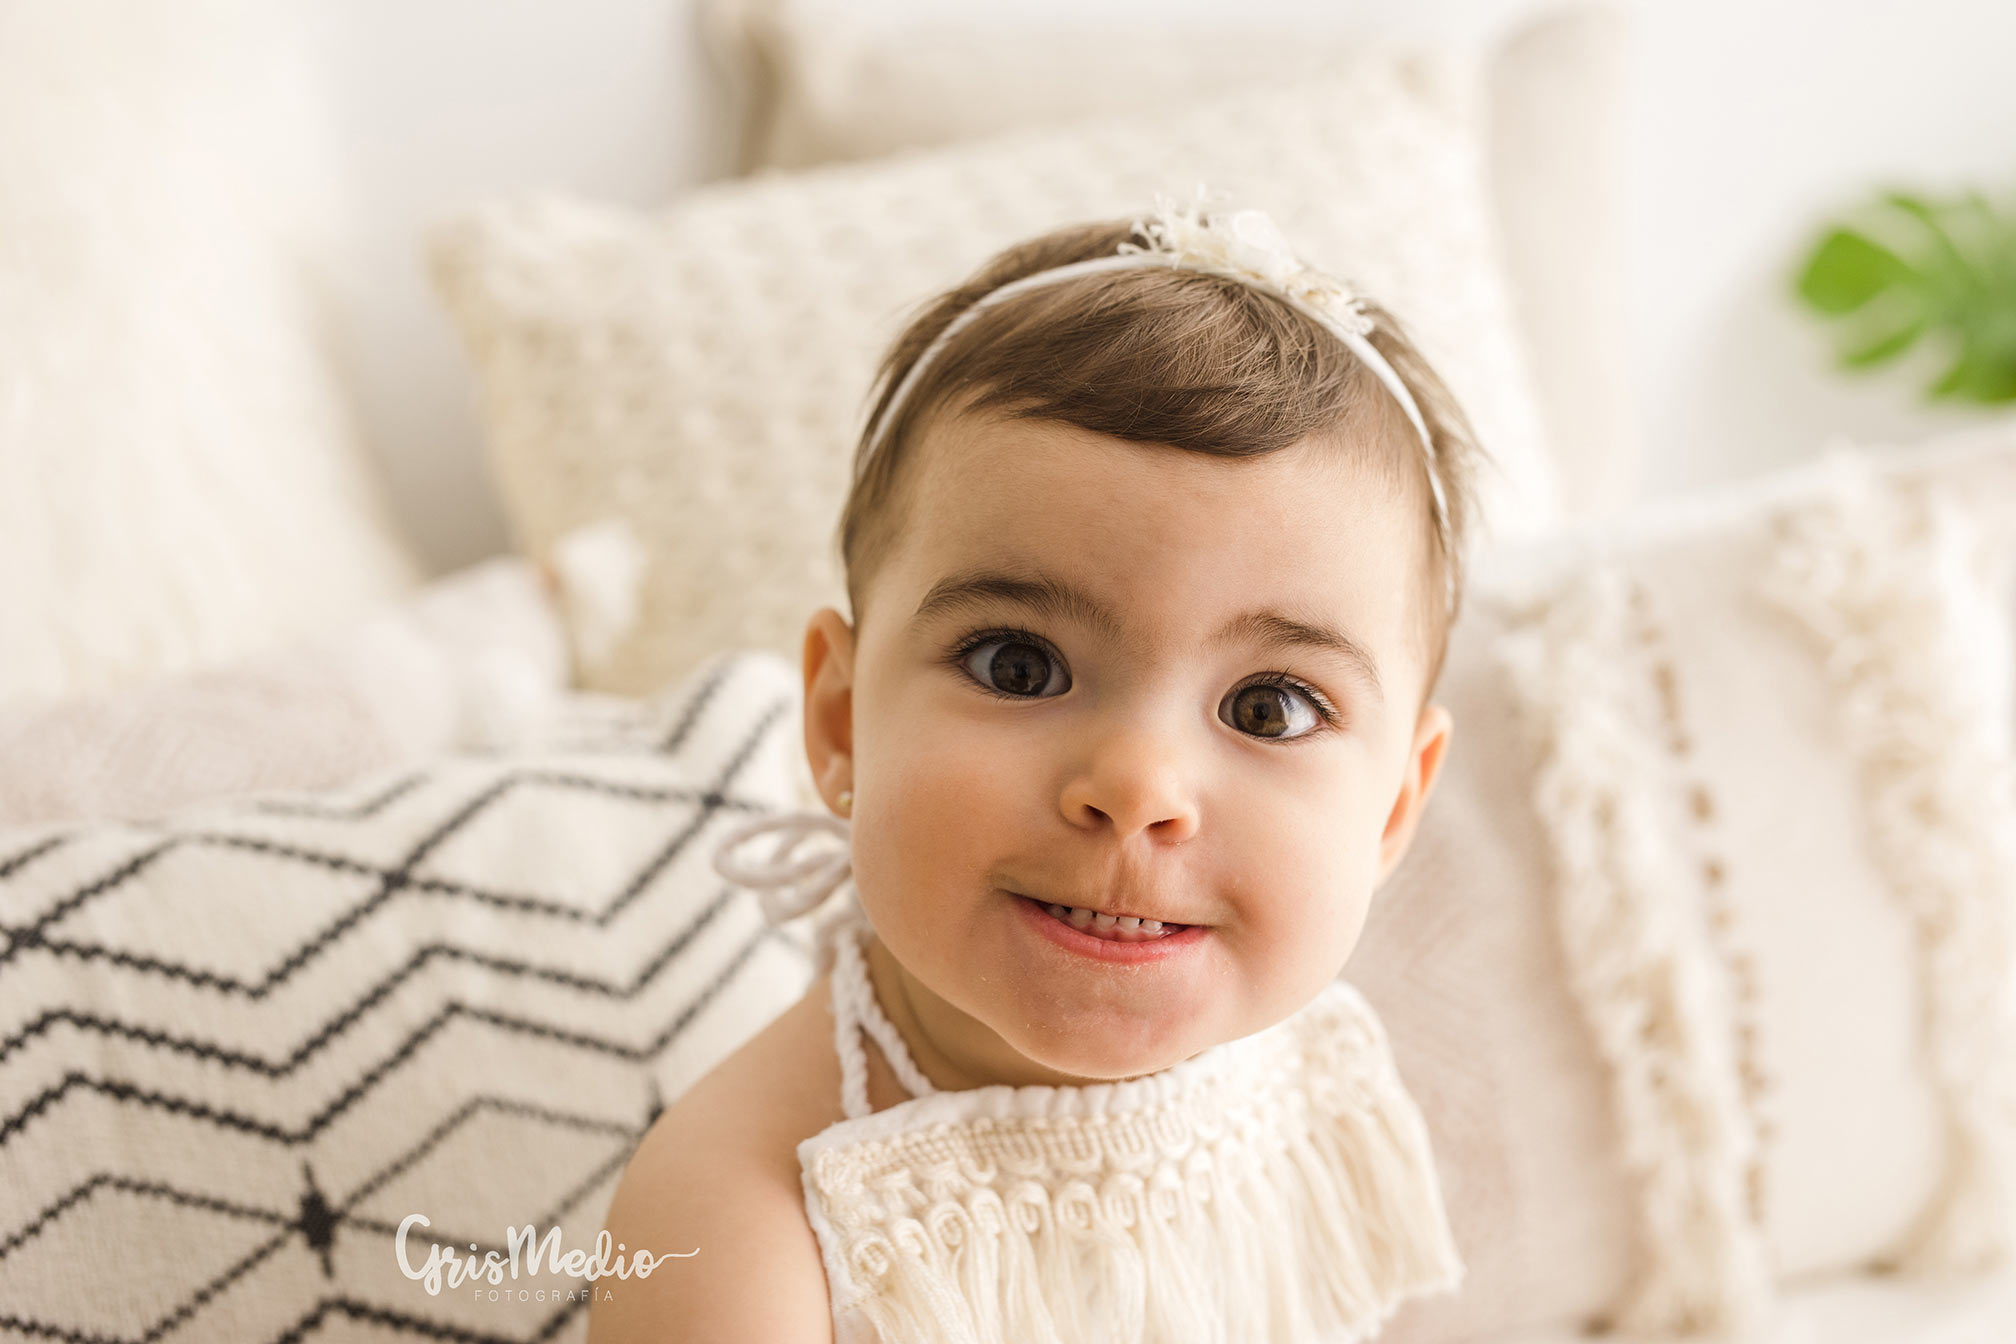 fotografia-familia-infantil-zaragoza-grismedio-bebe-lactancia25